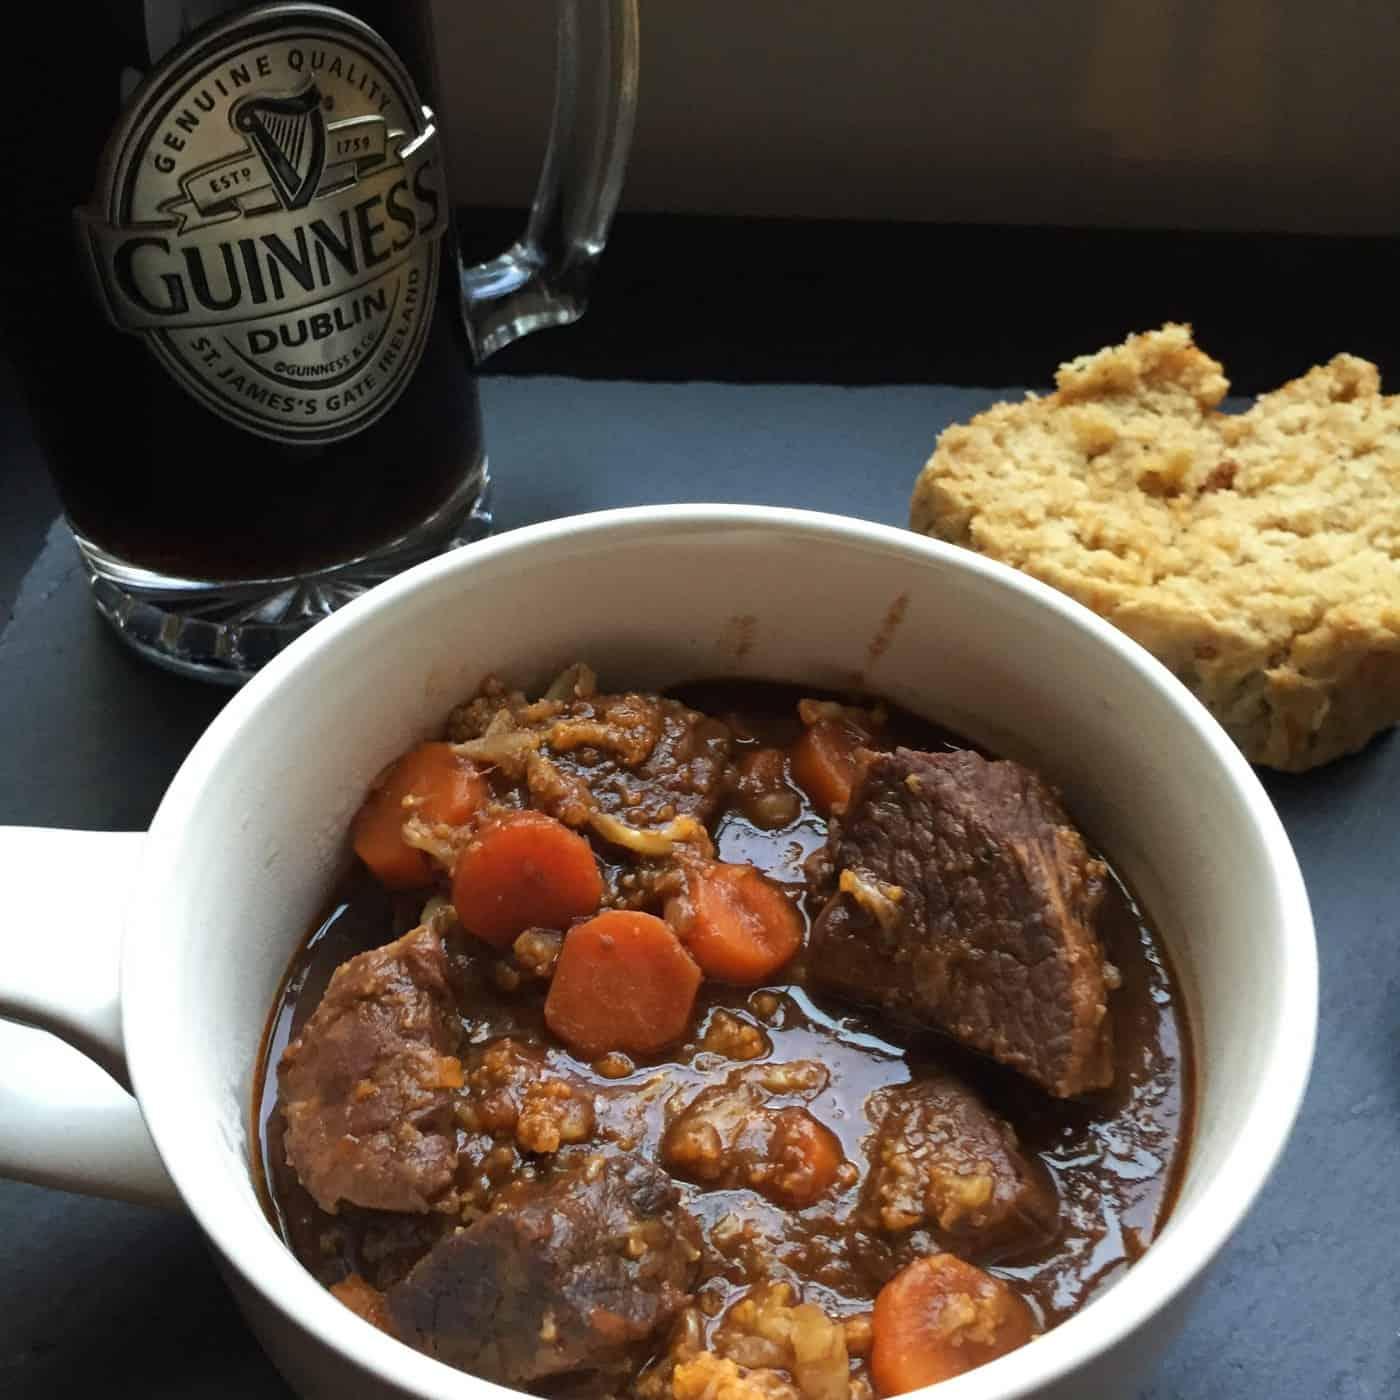 10 Healthier St. Patrick's Day Recipes